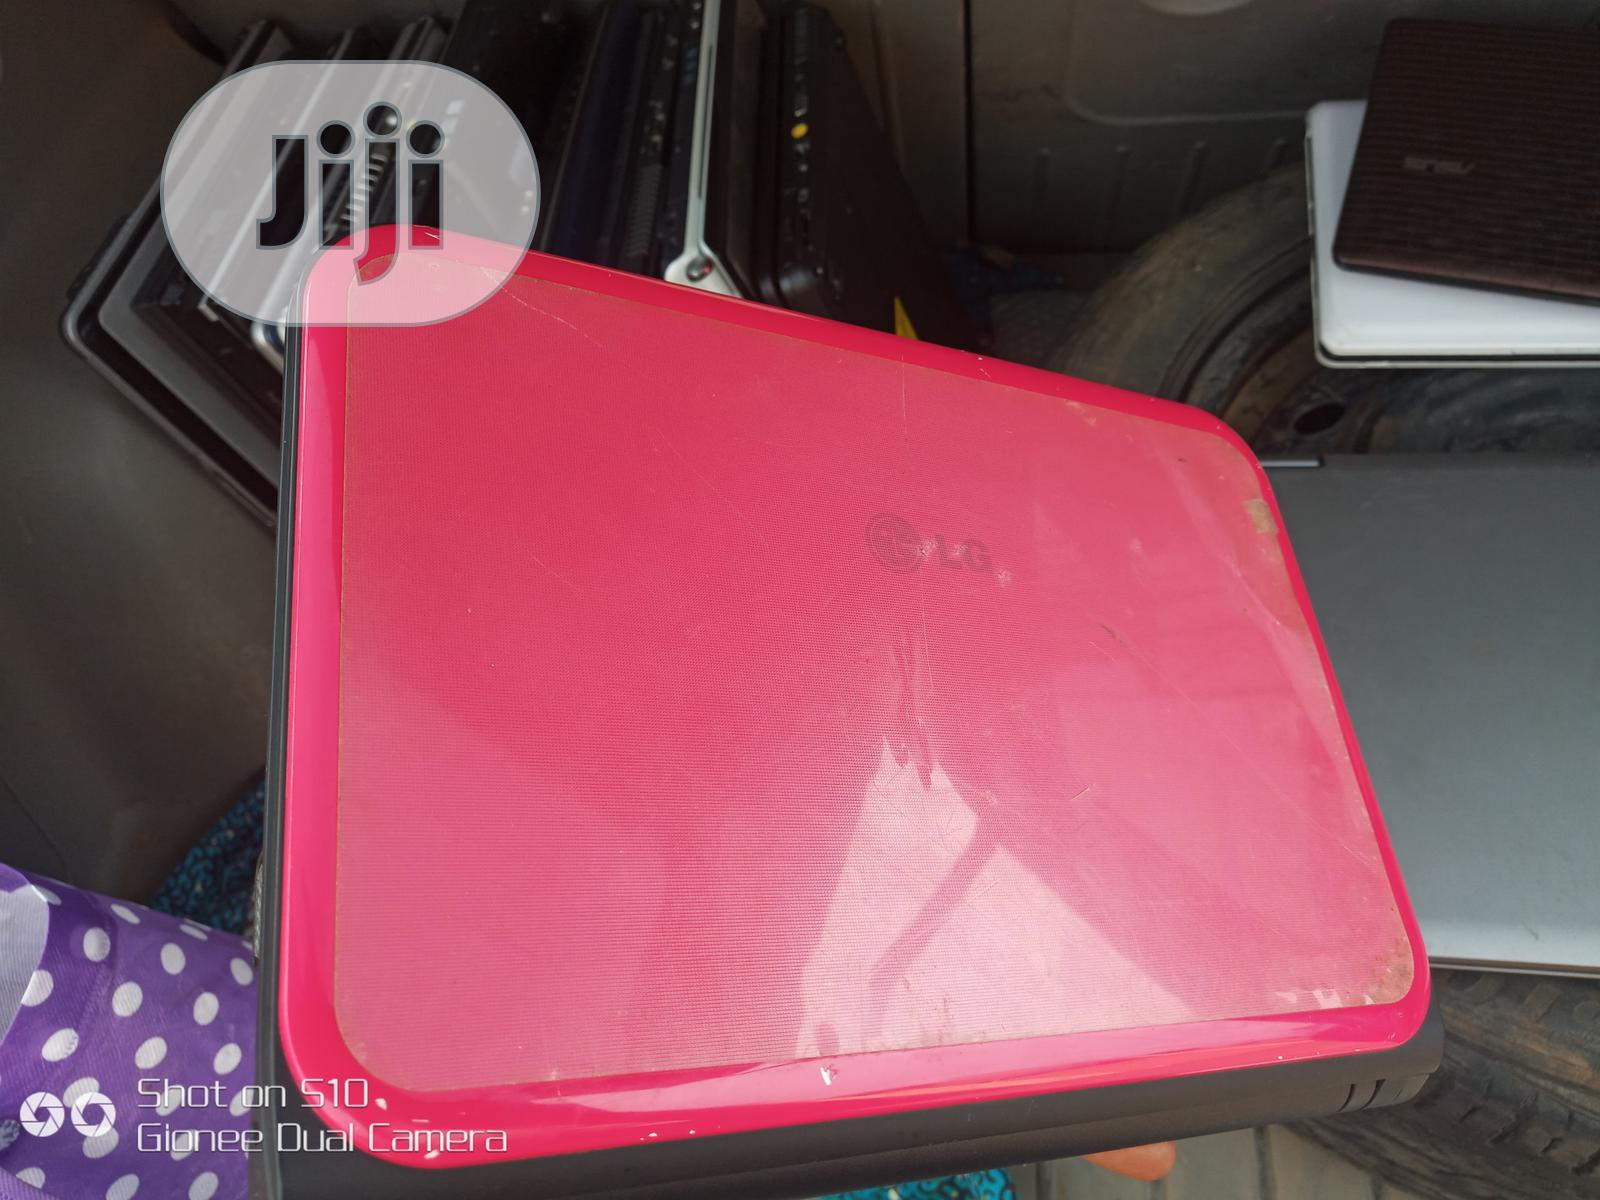 Laptop LG Gram 13.3 2GB Intel HDD 160GB | Laptops & Computers for sale in Kubwa, Abuja (FCT) State, Nigeria